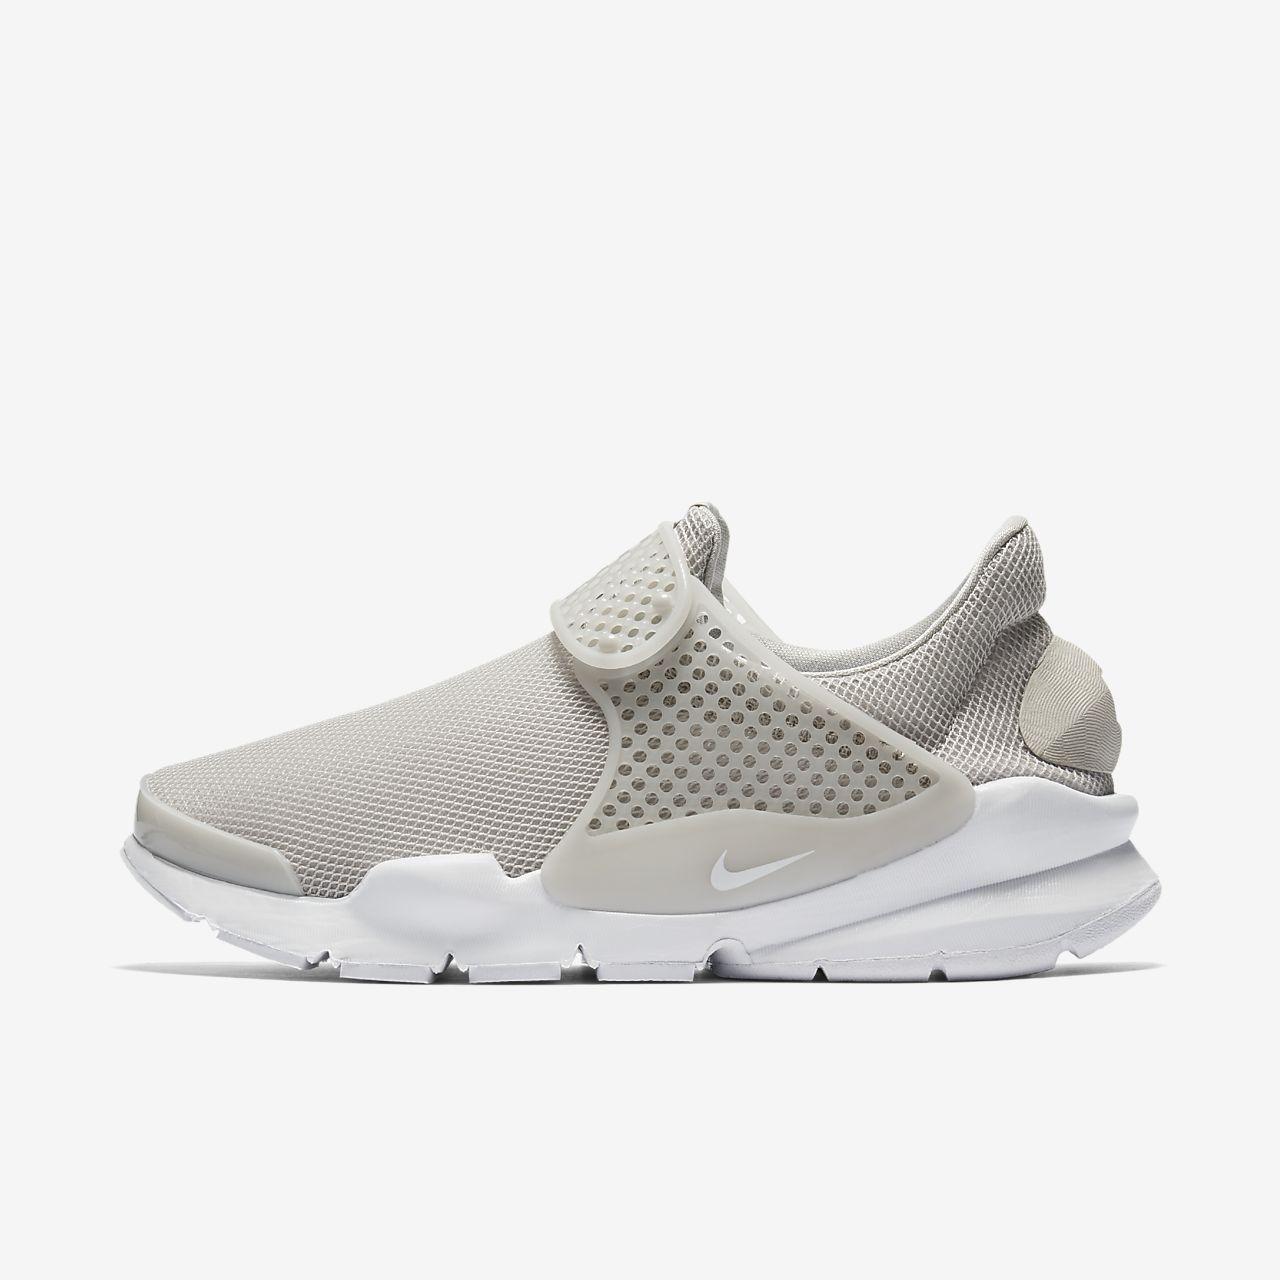 Chaussure Nike Sock Dart Breathe pour CH